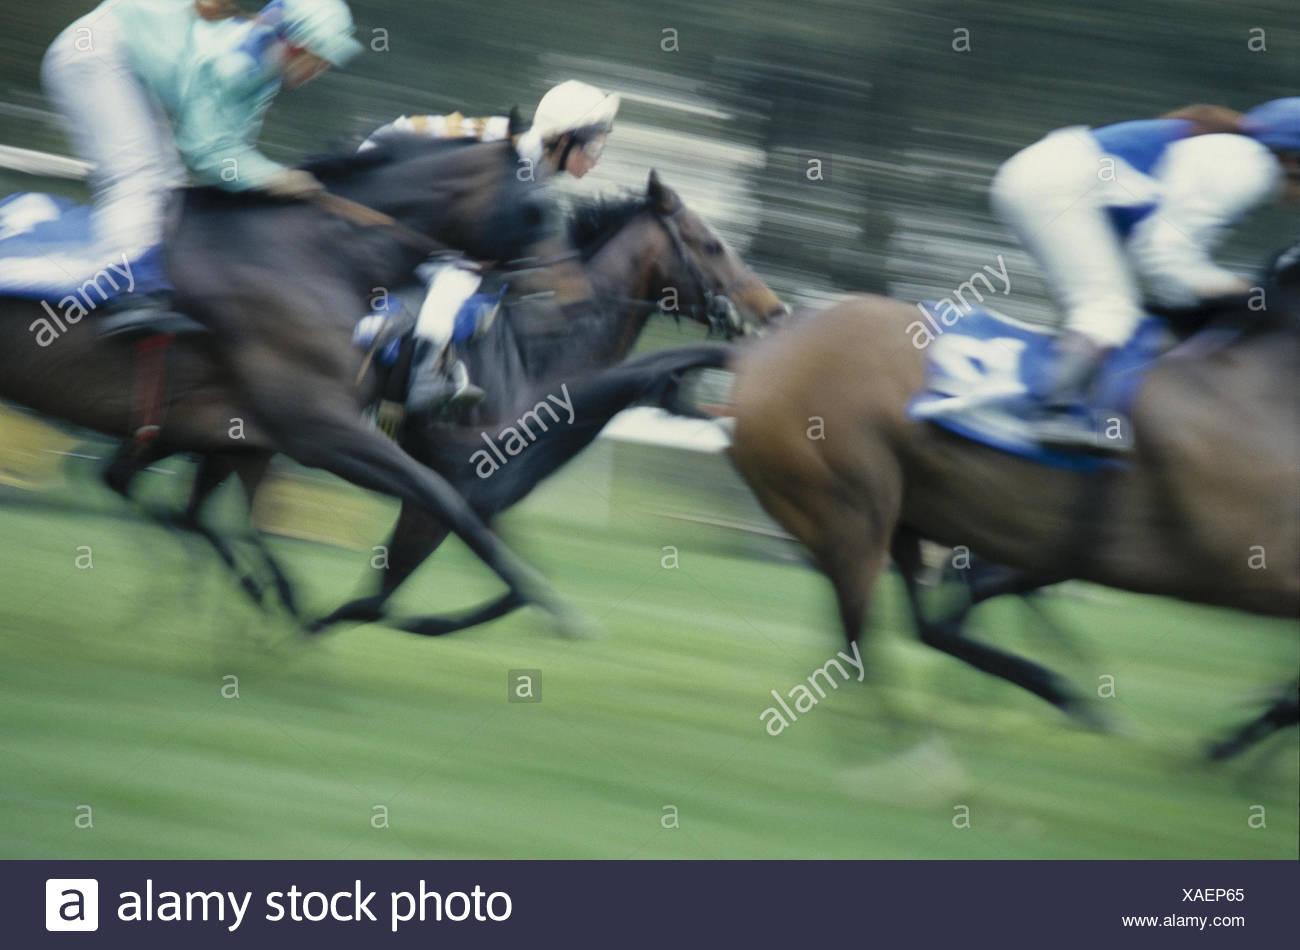 Gallop Races Detail Blur Side View Racecourse Horses Race Riding Galopper Jockeys Ride Bleed